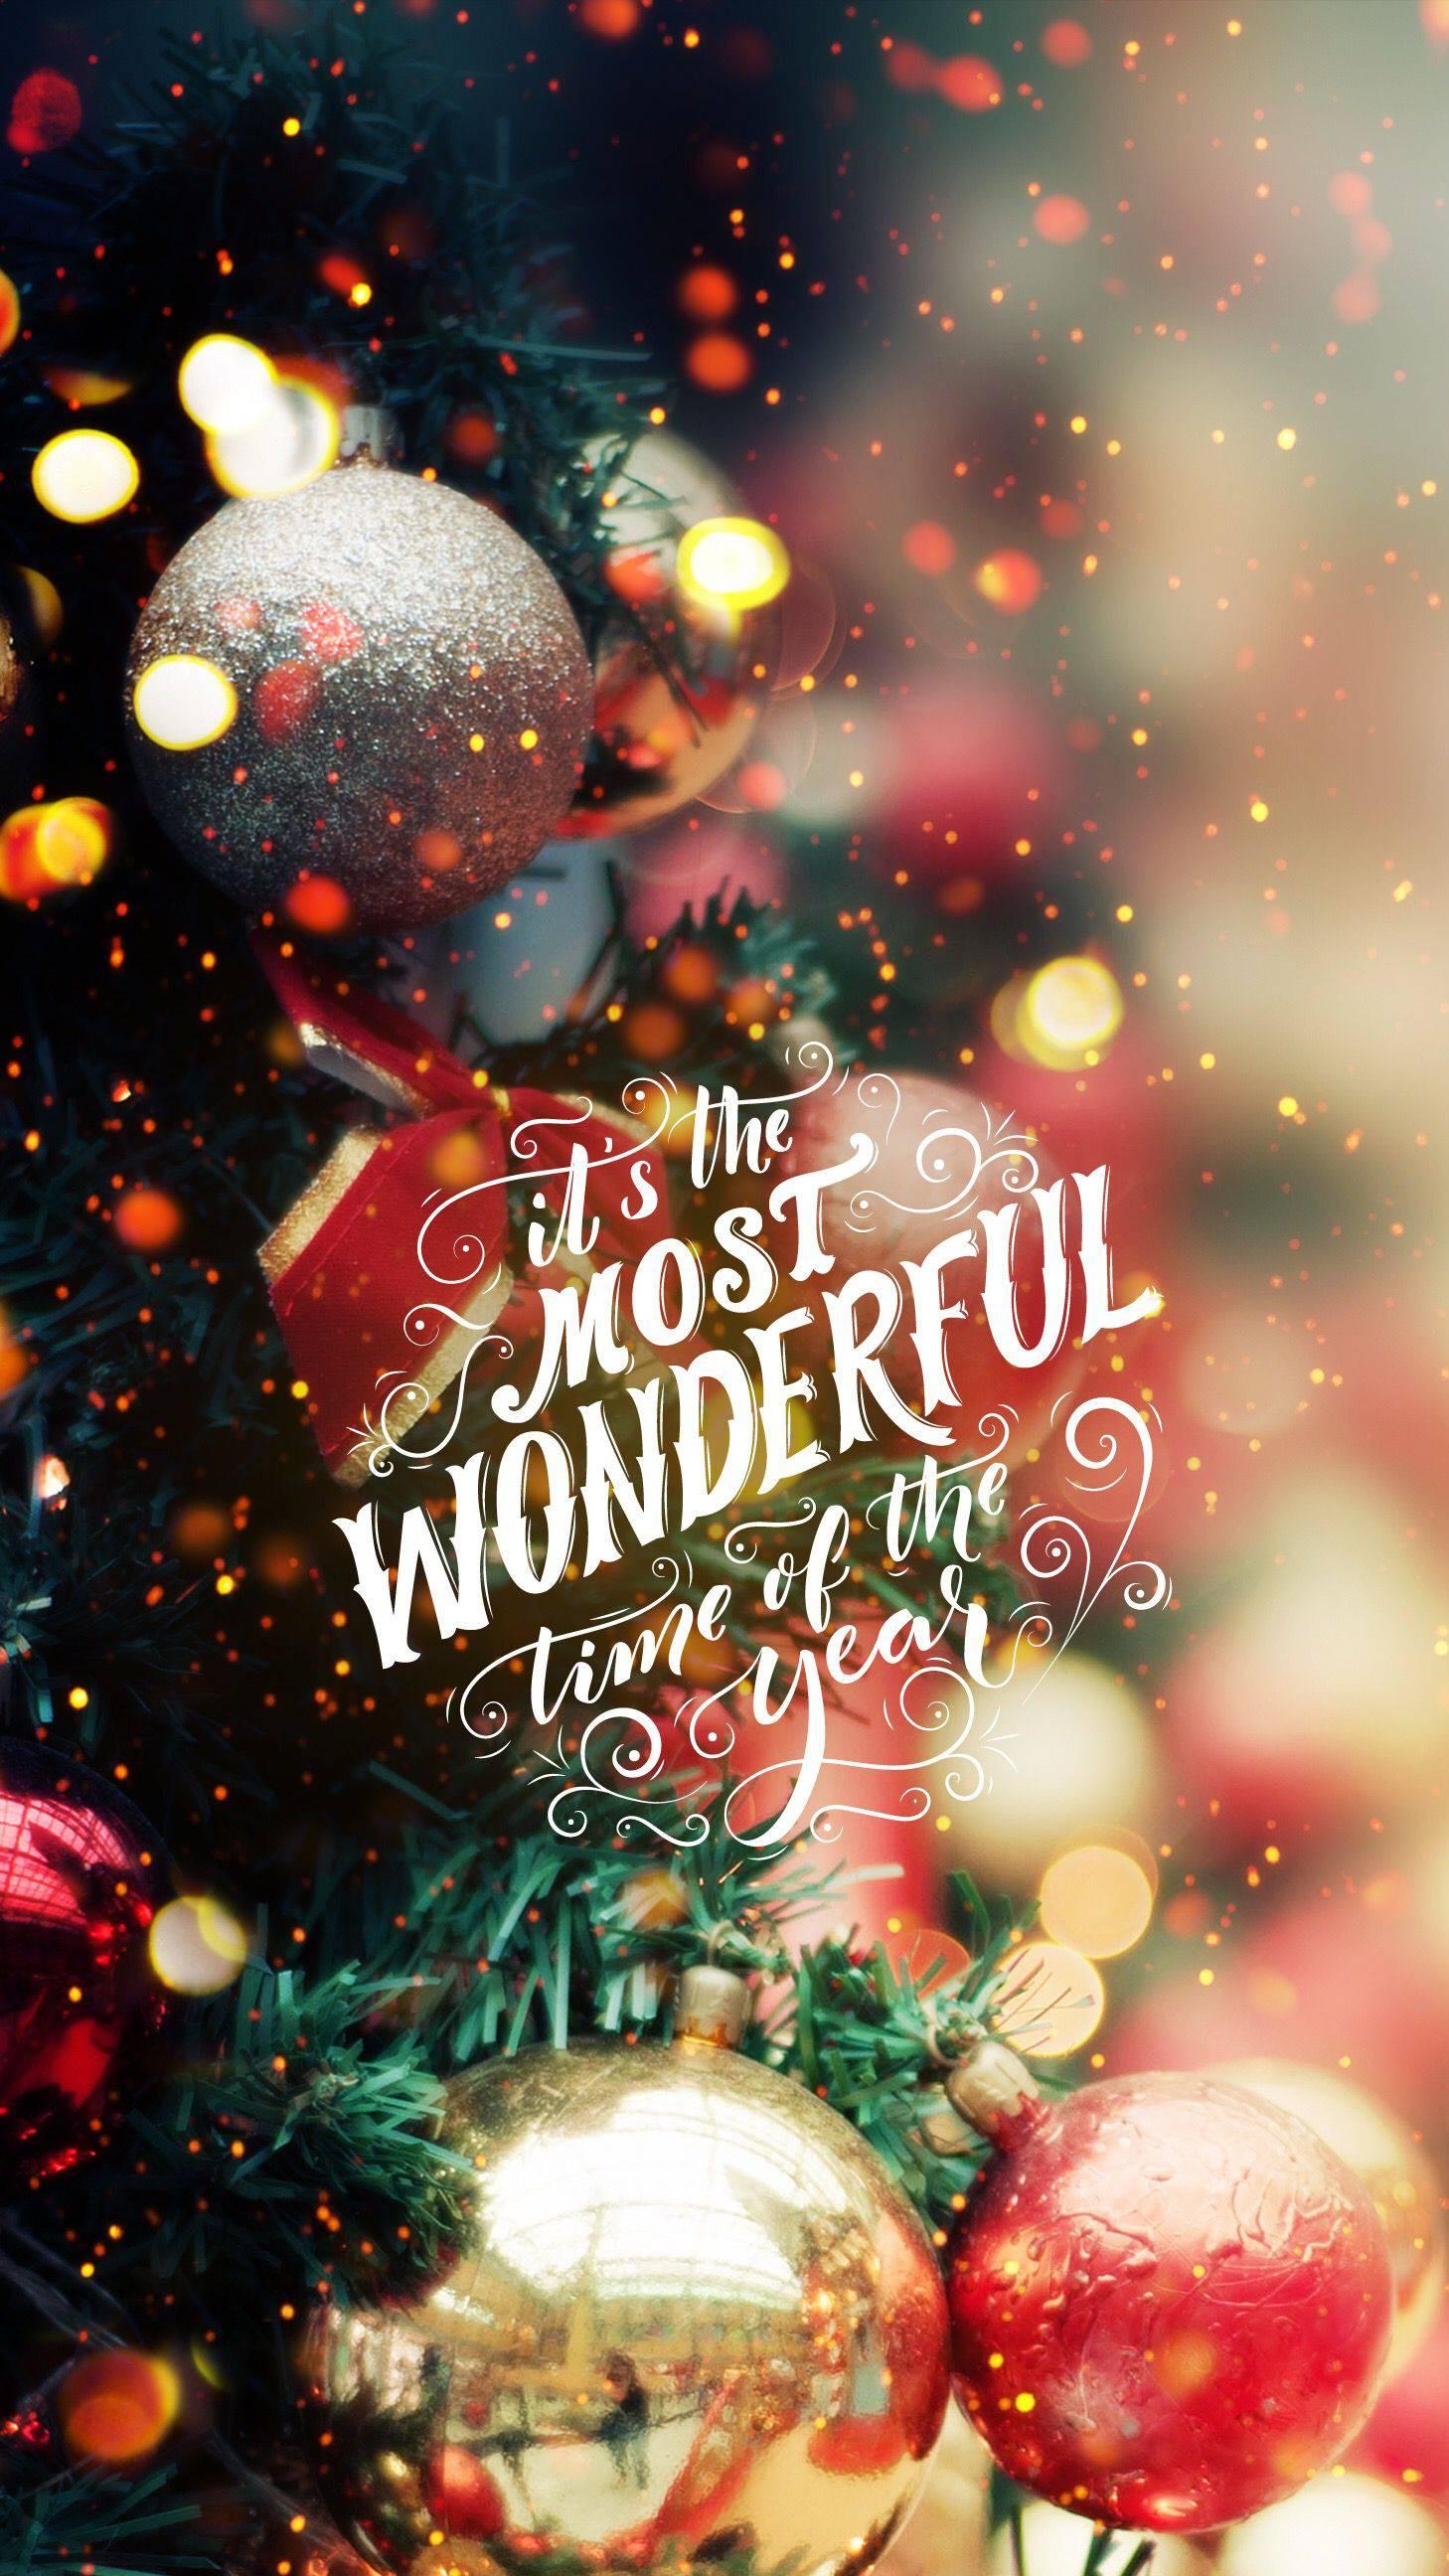 Wonderful Christmas iPhone Wallpaper